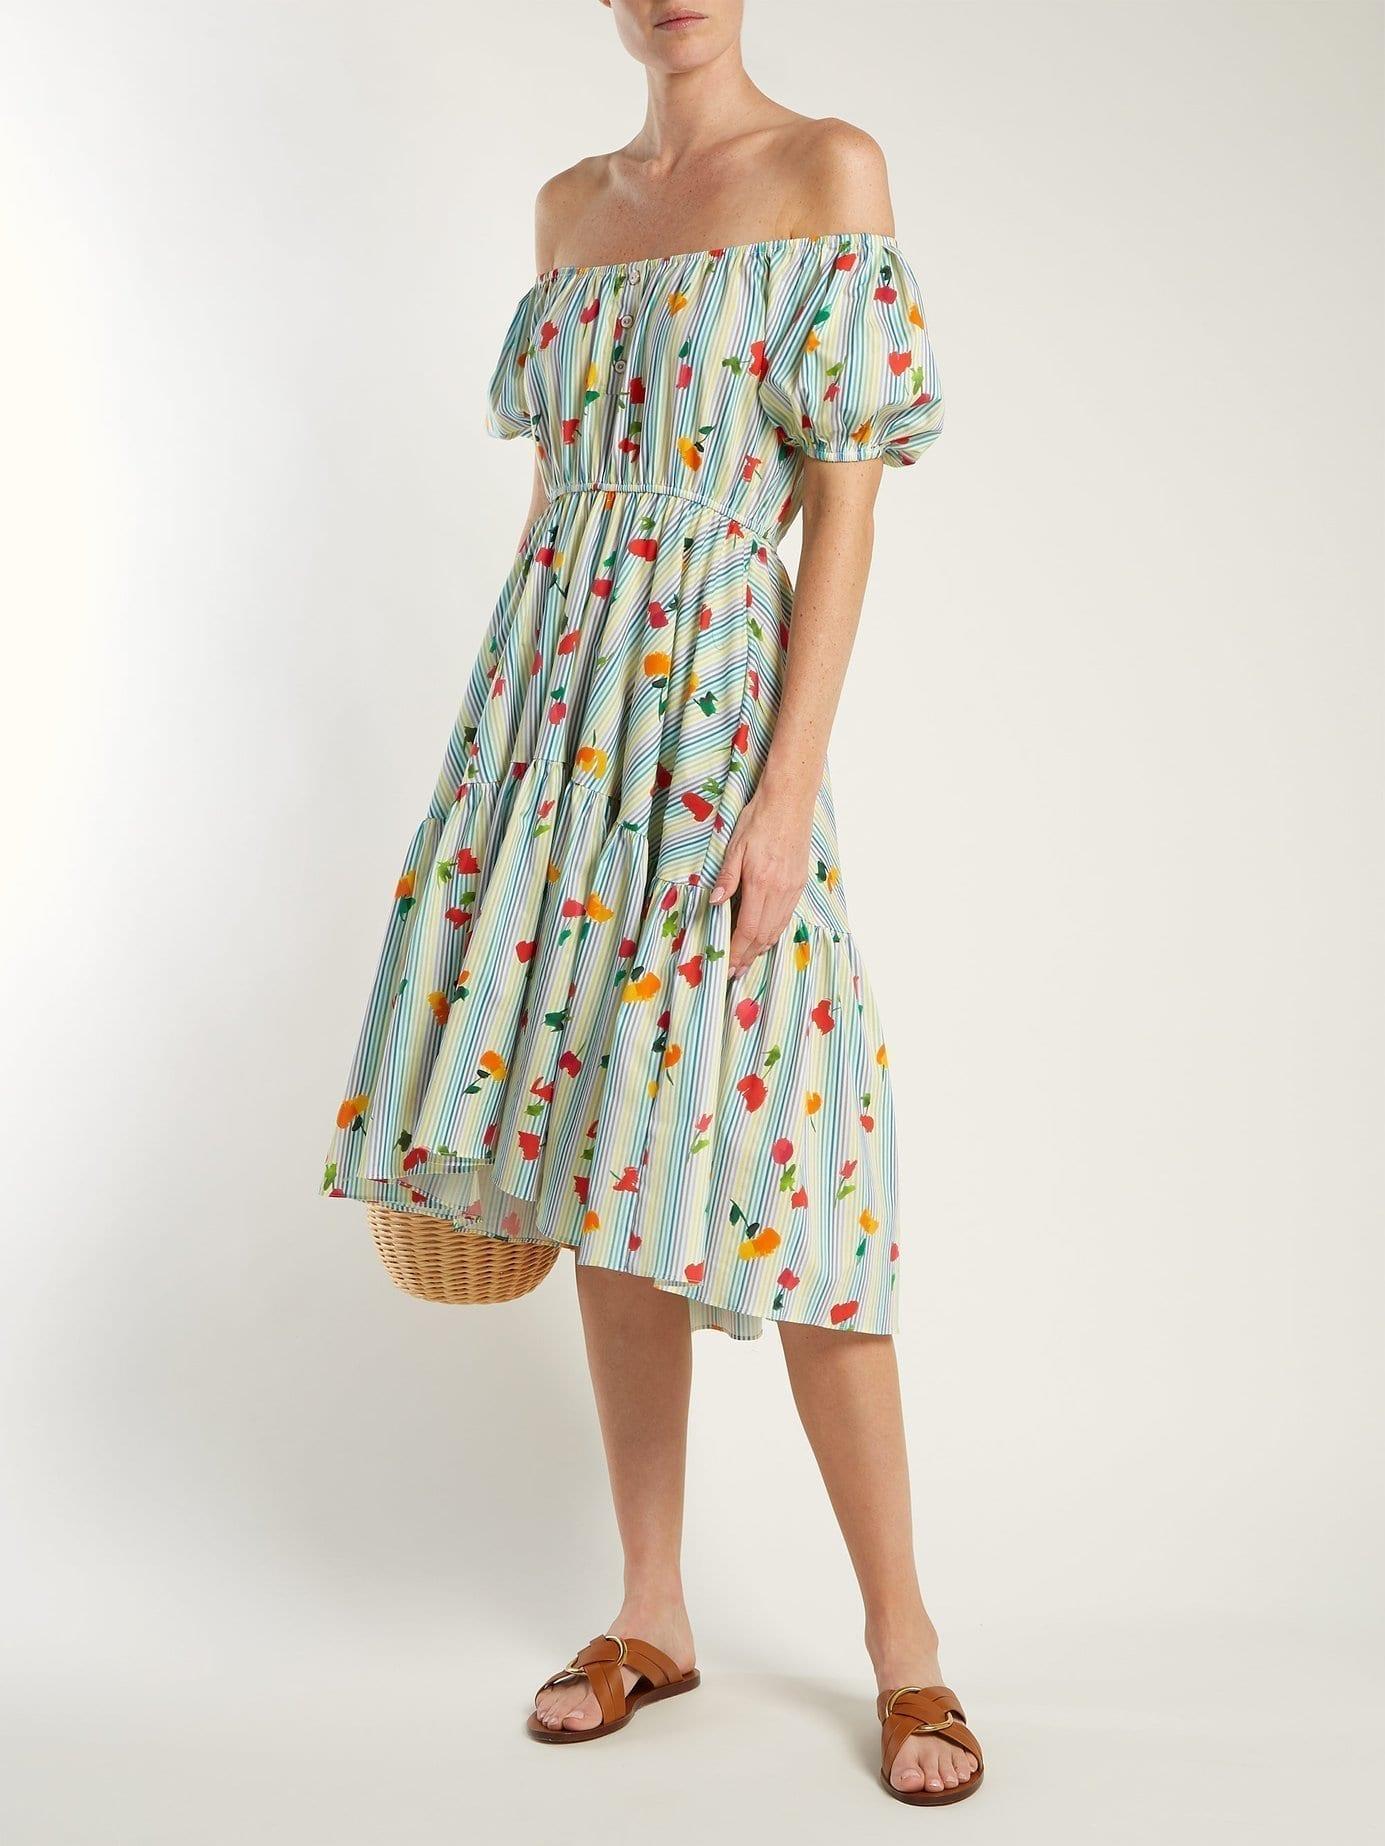 CAROLINE CONSTAS Striped Cotton-Blend Blue / Floral Printed Dress